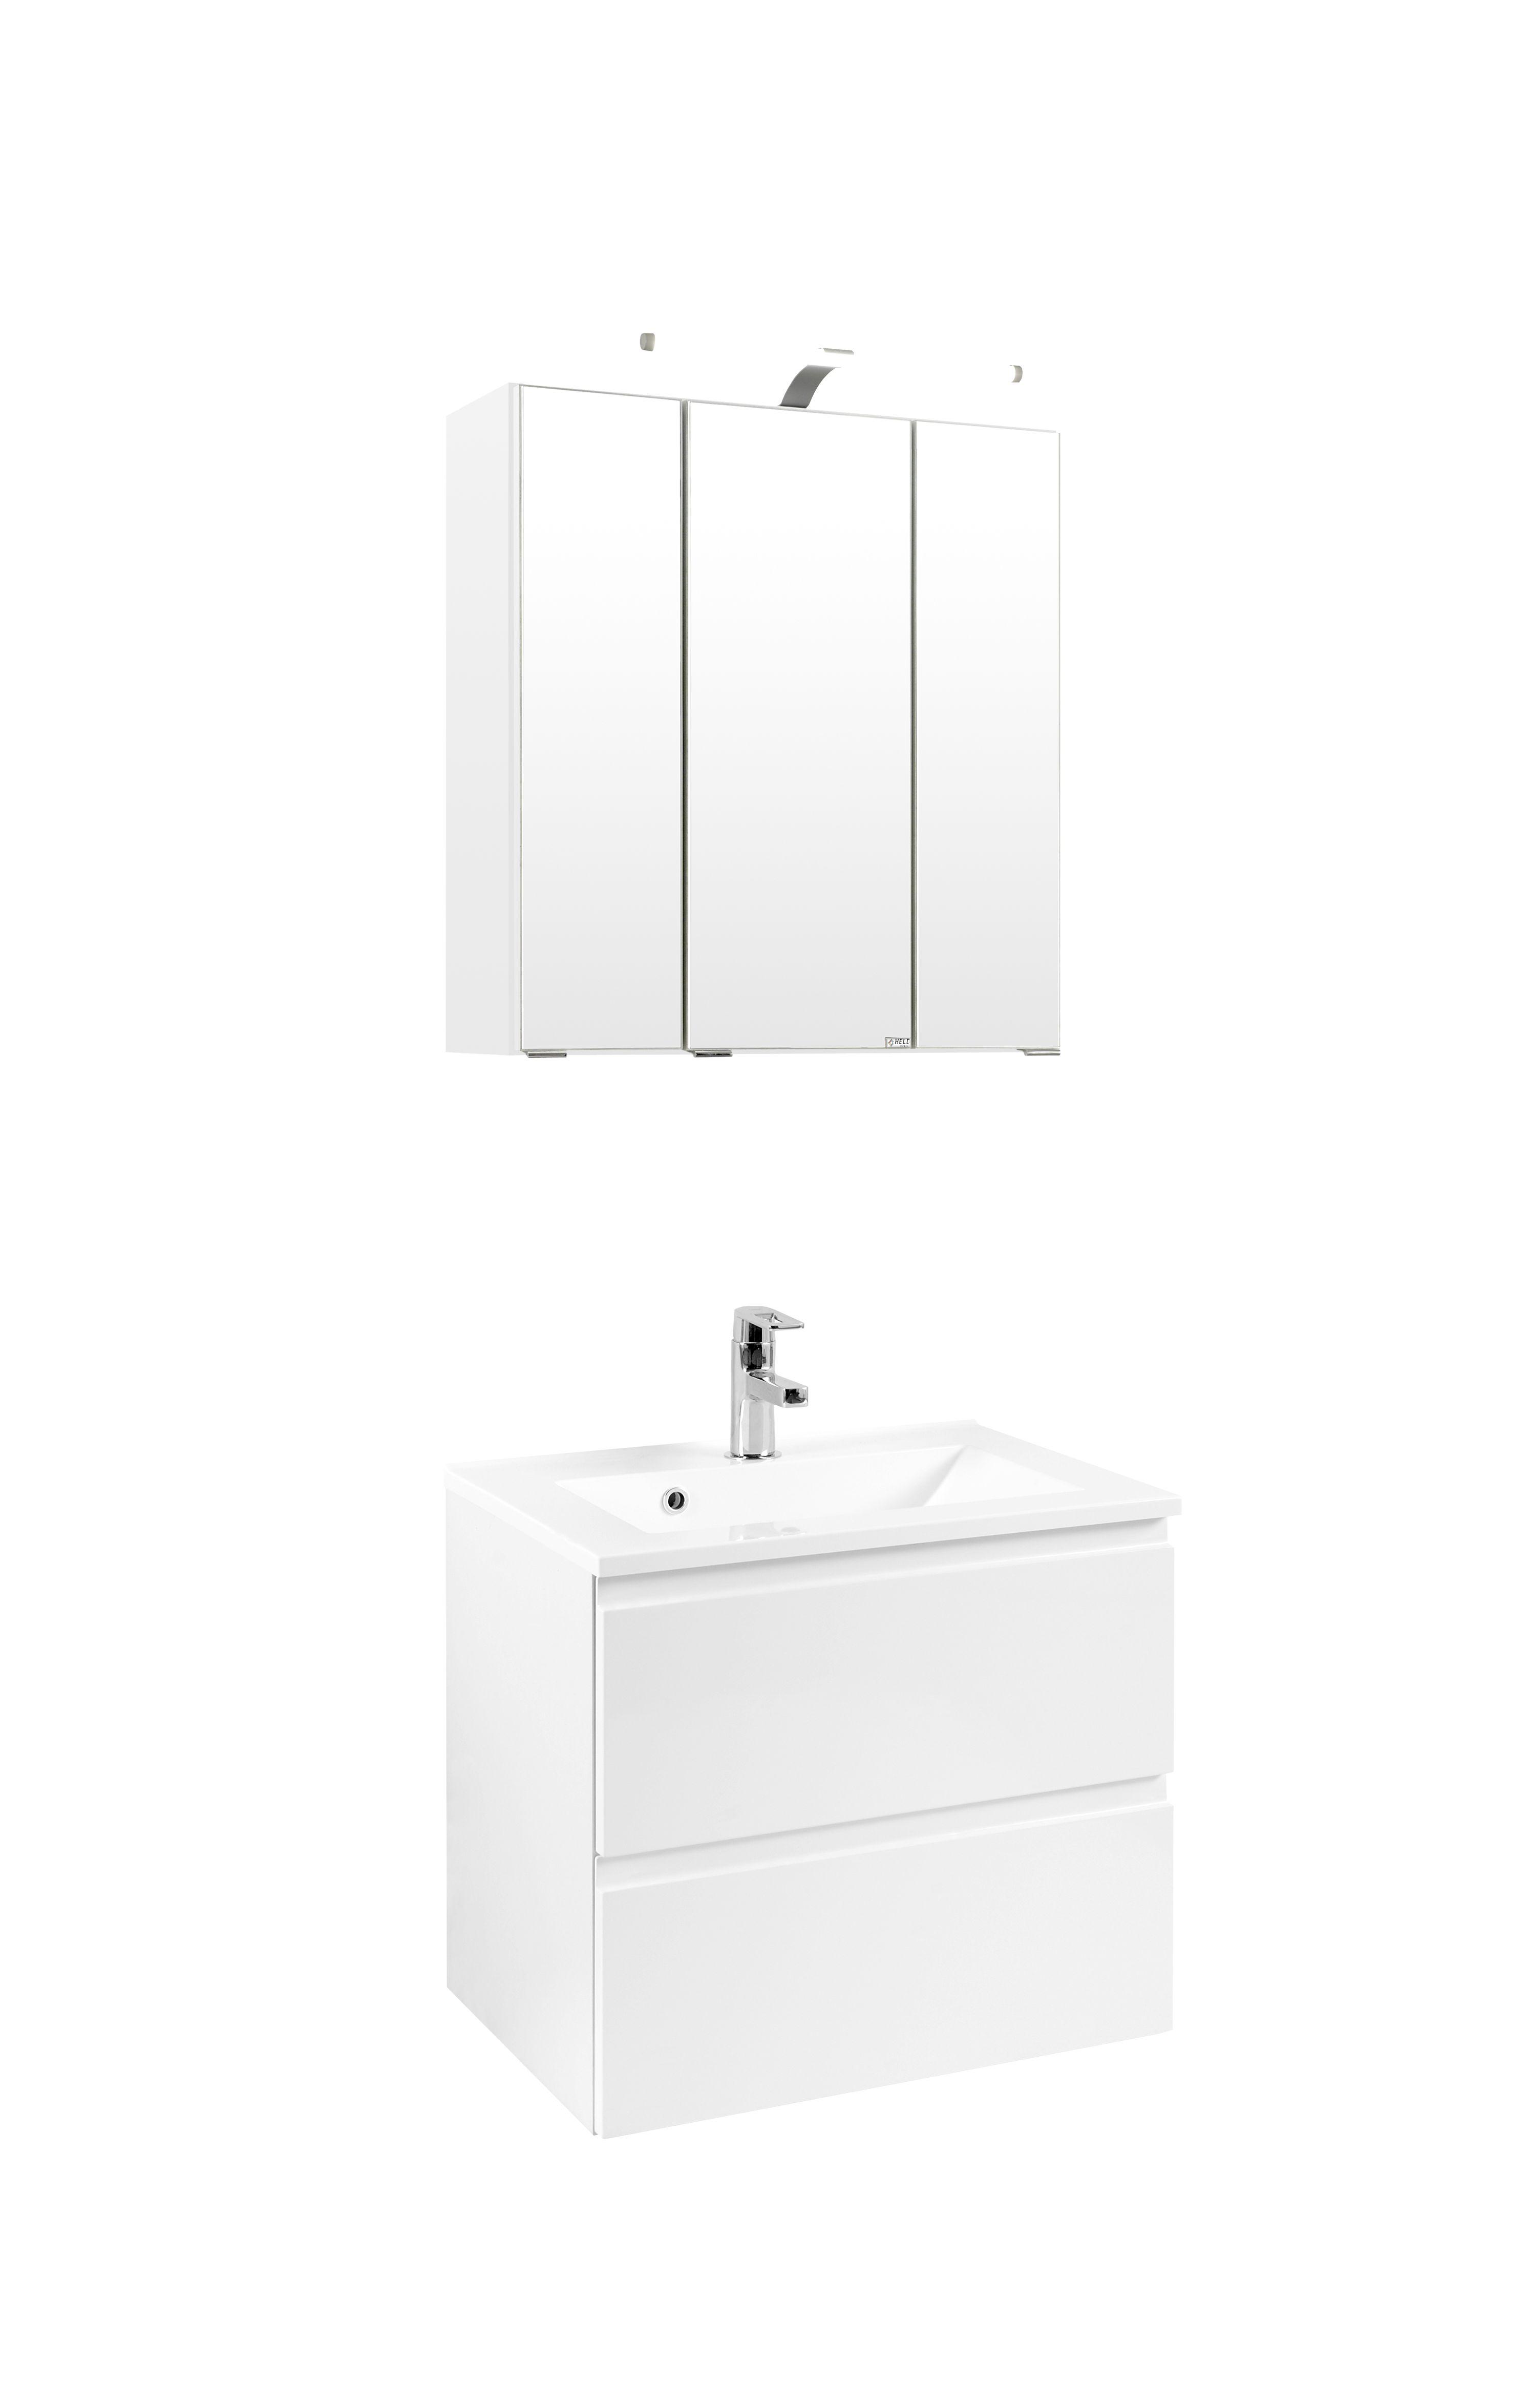 waschtisch set 60 cardiff inkl led beleuchtung von held m bel wei. Black Bedroom Furniture Sets. Home Design Ideas